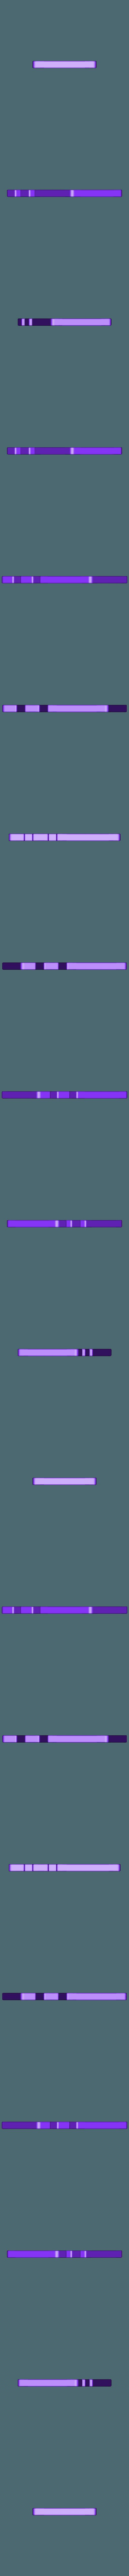 part4x2.stl Download free STL file The lattice puzzle • 3D printing object, dancingchicken